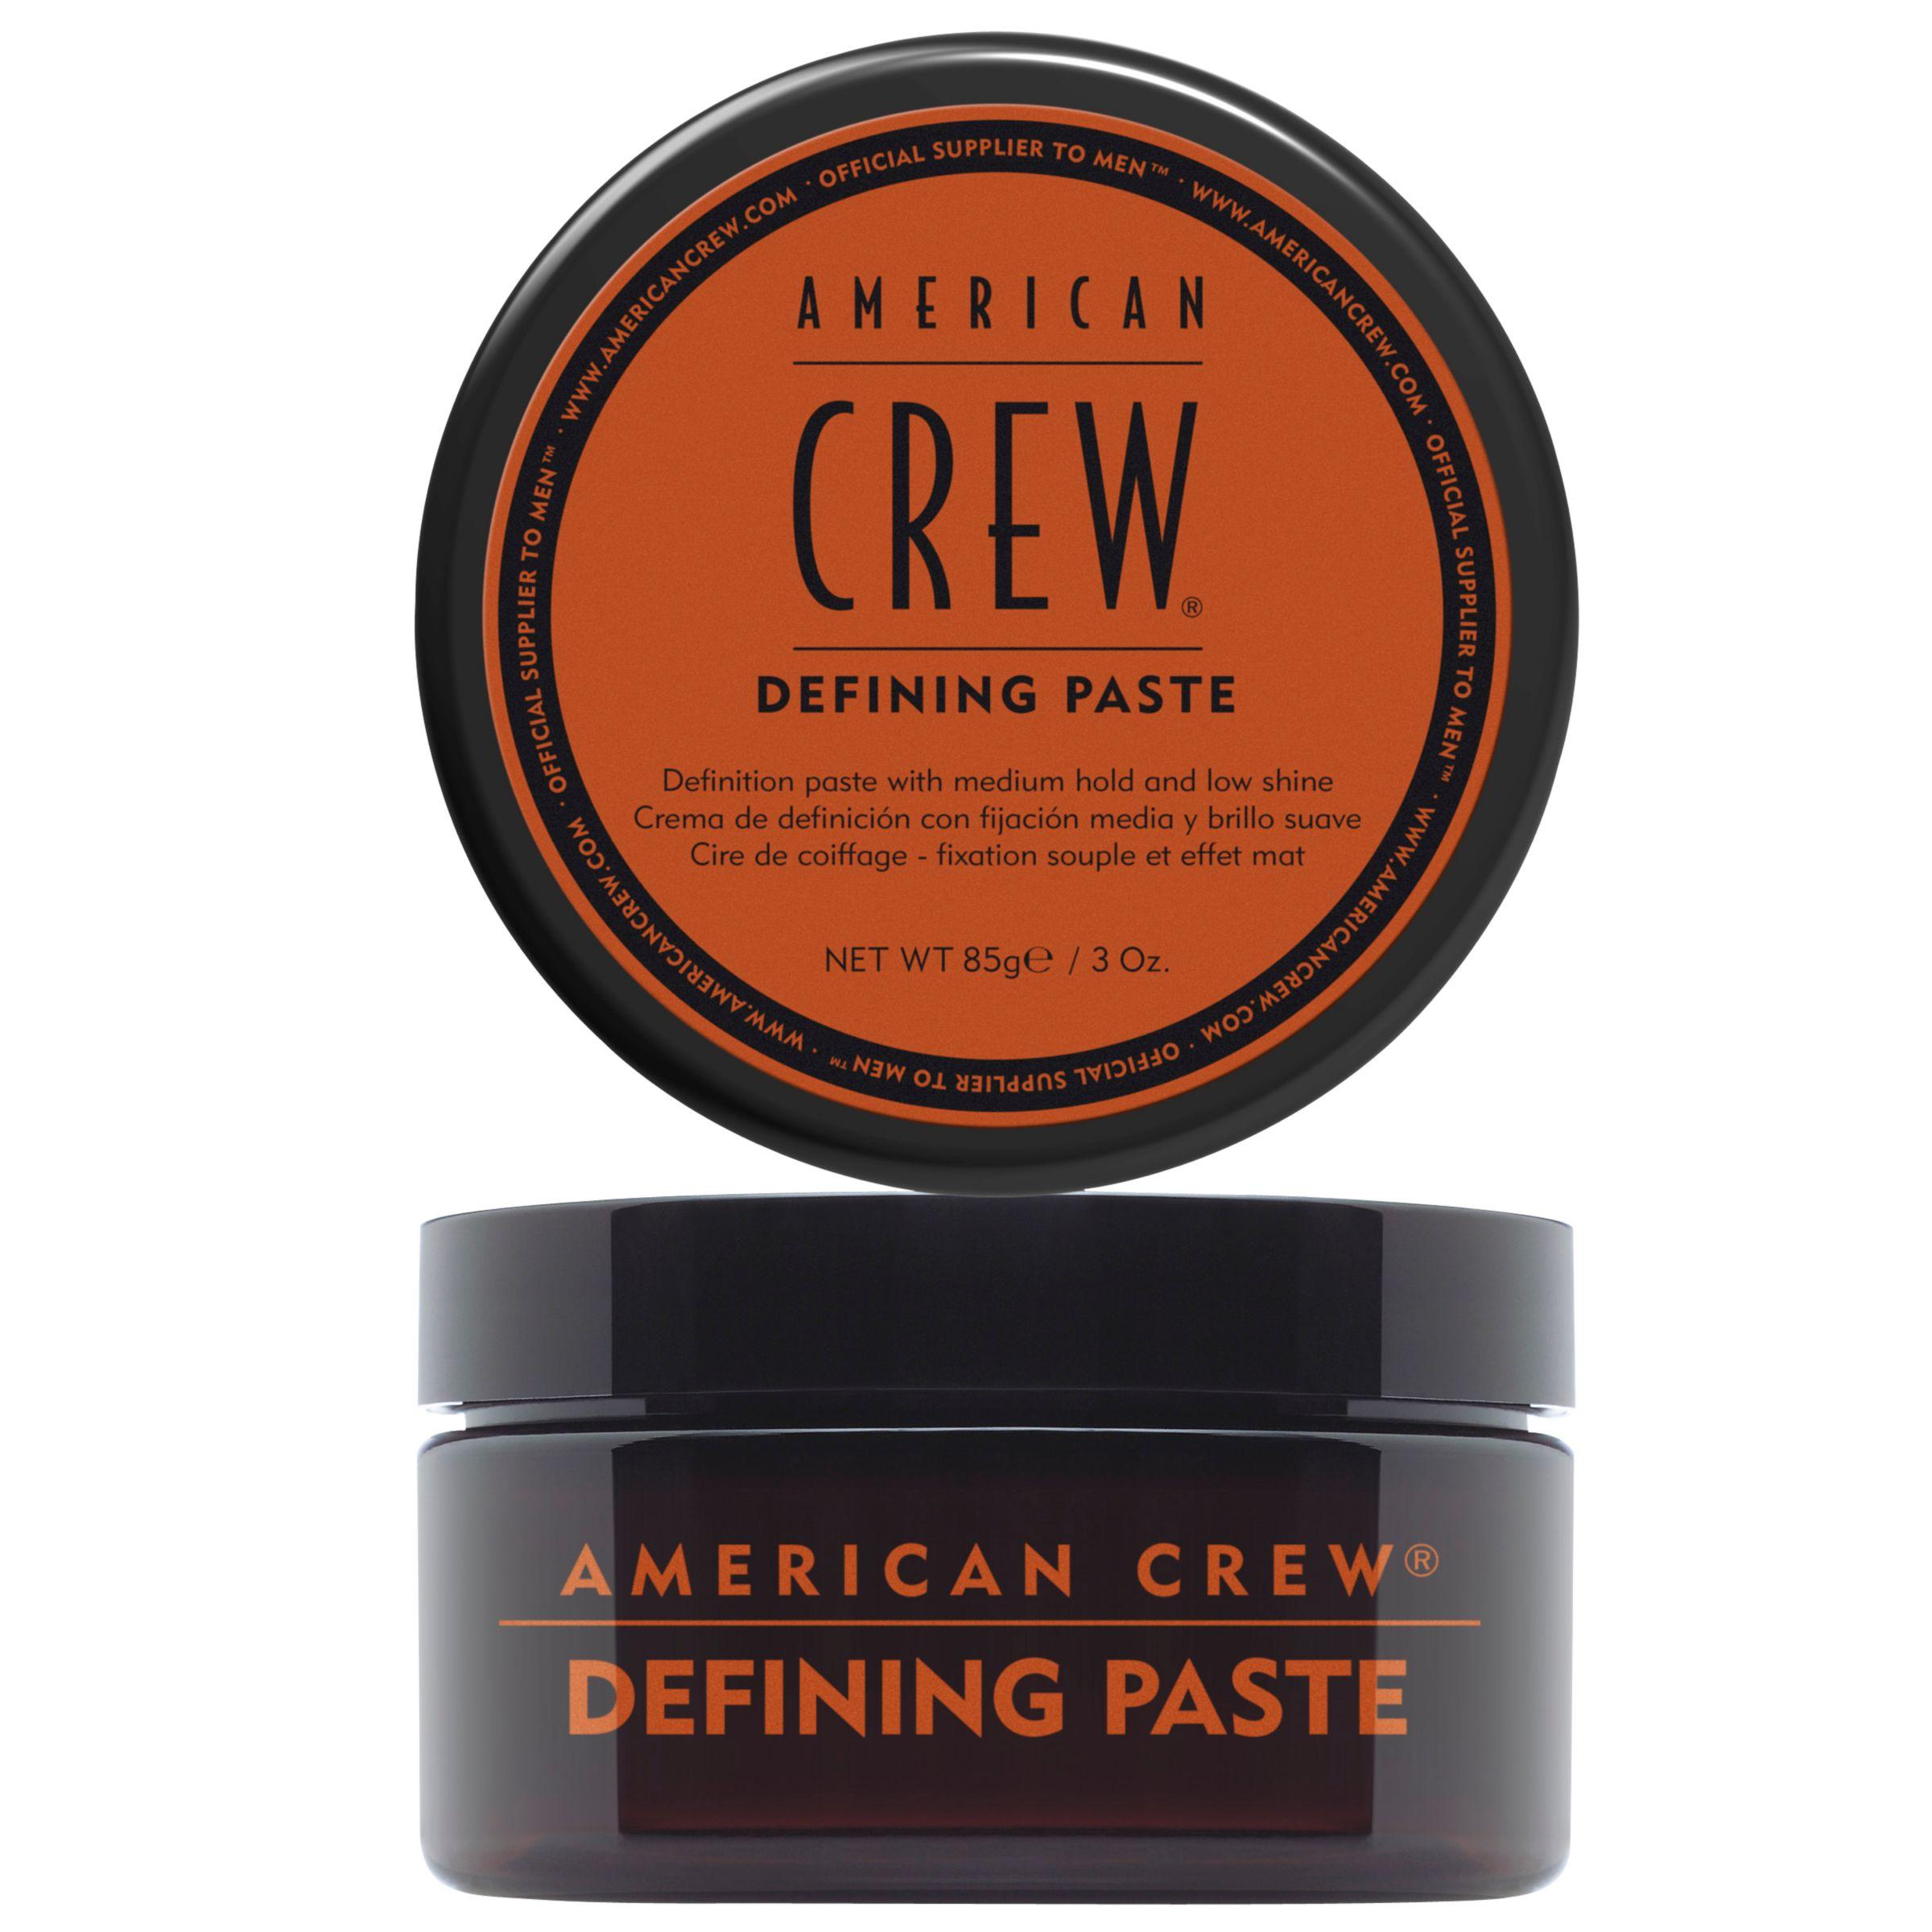 American Crew American Crew Defining Paste, 85g